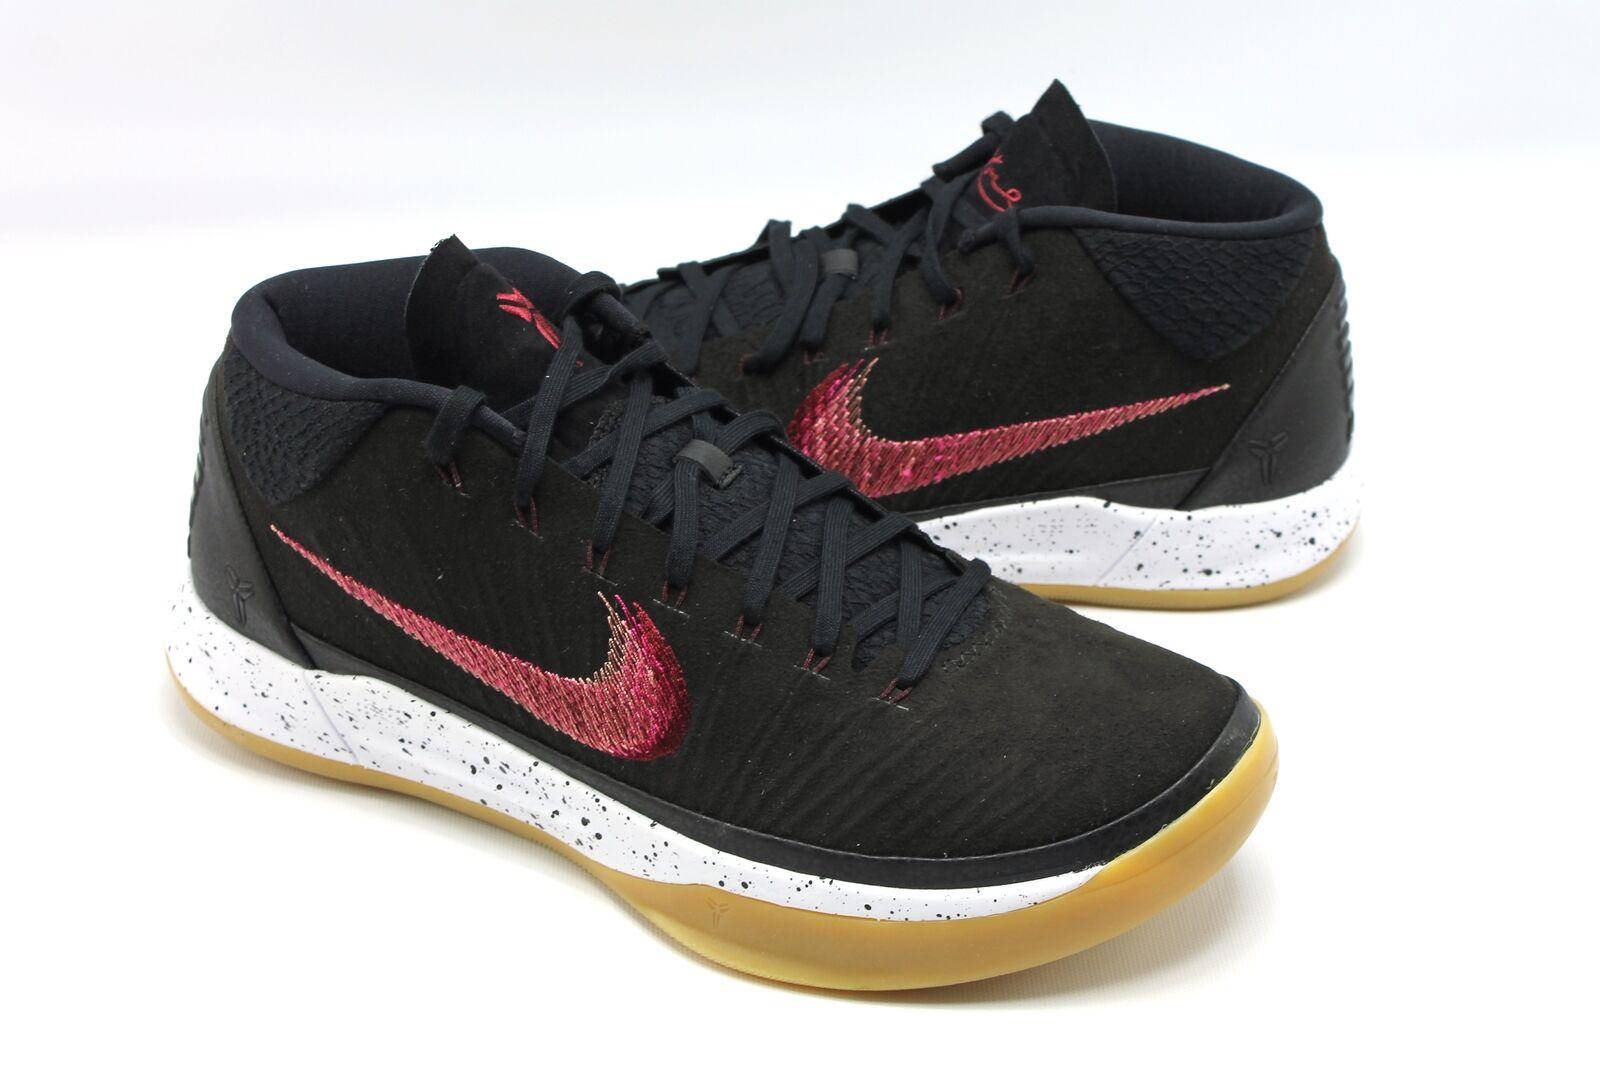 Nuevo goma anuncio de Nike Kobe zapatos Negro Sail goma Nuevo cosida Swoosh hombre 11 90d6e5